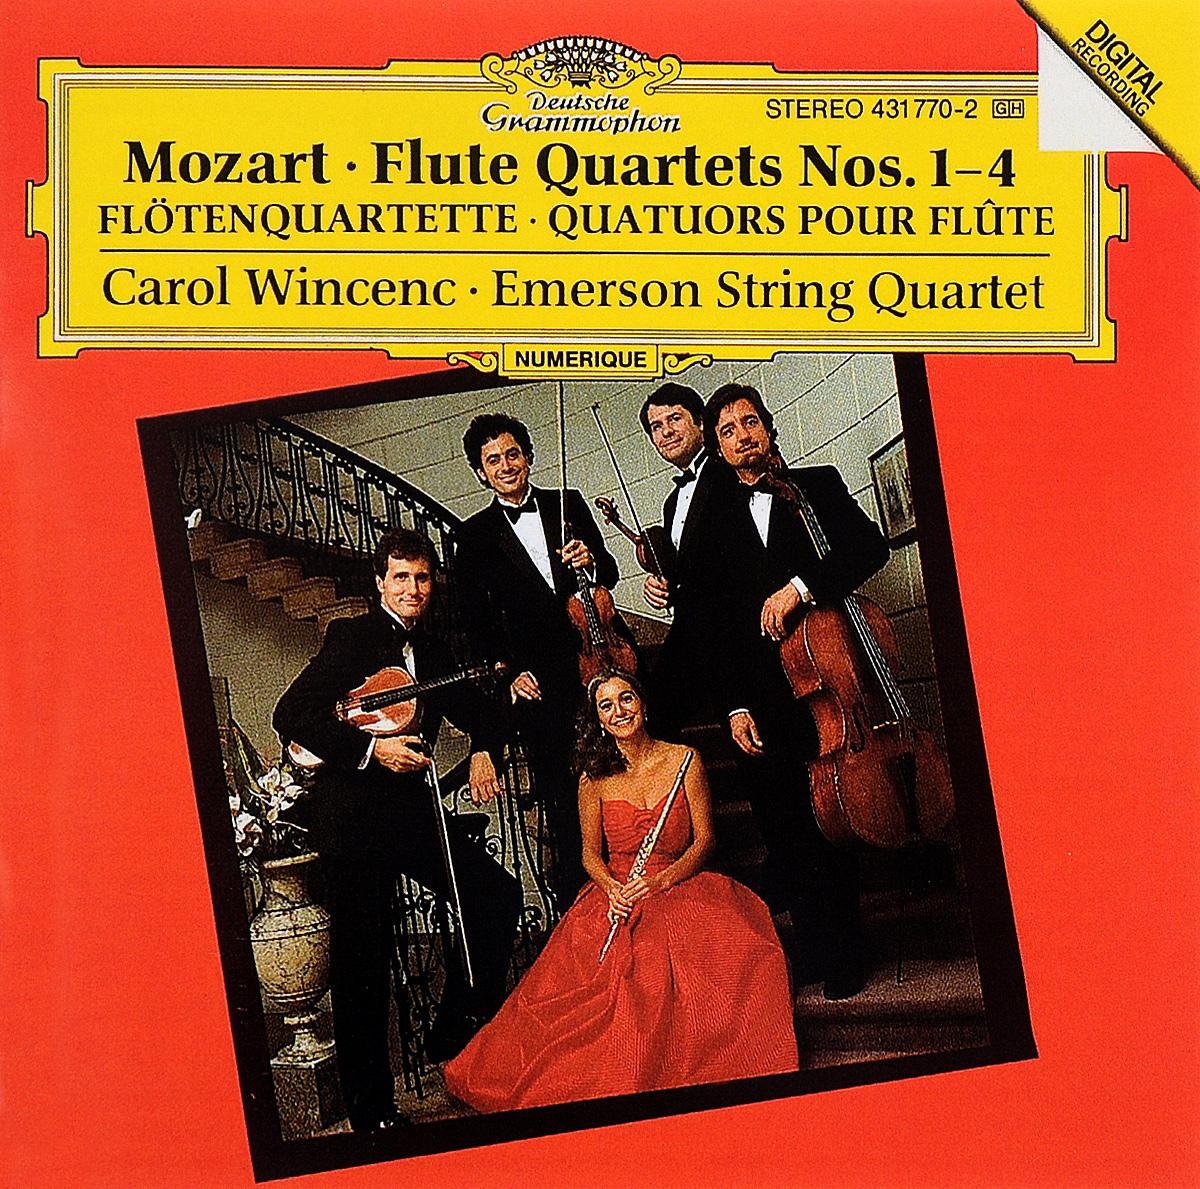 Carol Wincenc,Emerson String Quartet Carol Wincenc. Mozart. Flute Quartets Nos. 1-4 emerson string quartet complete string quartets mendelssohn emerson string quartet 4 cd